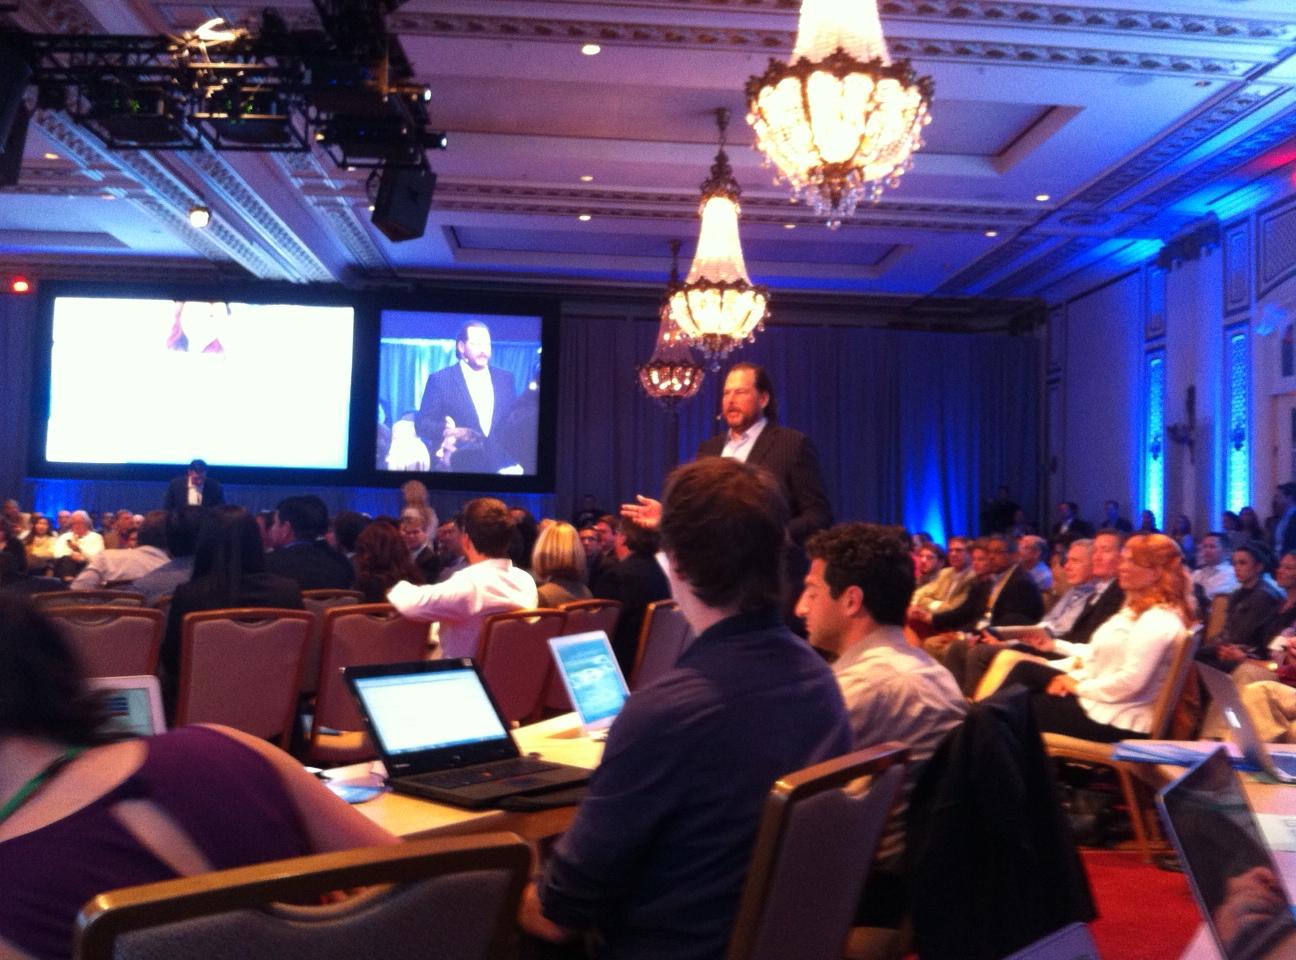 Salesforce.com CEO Marc Benioff